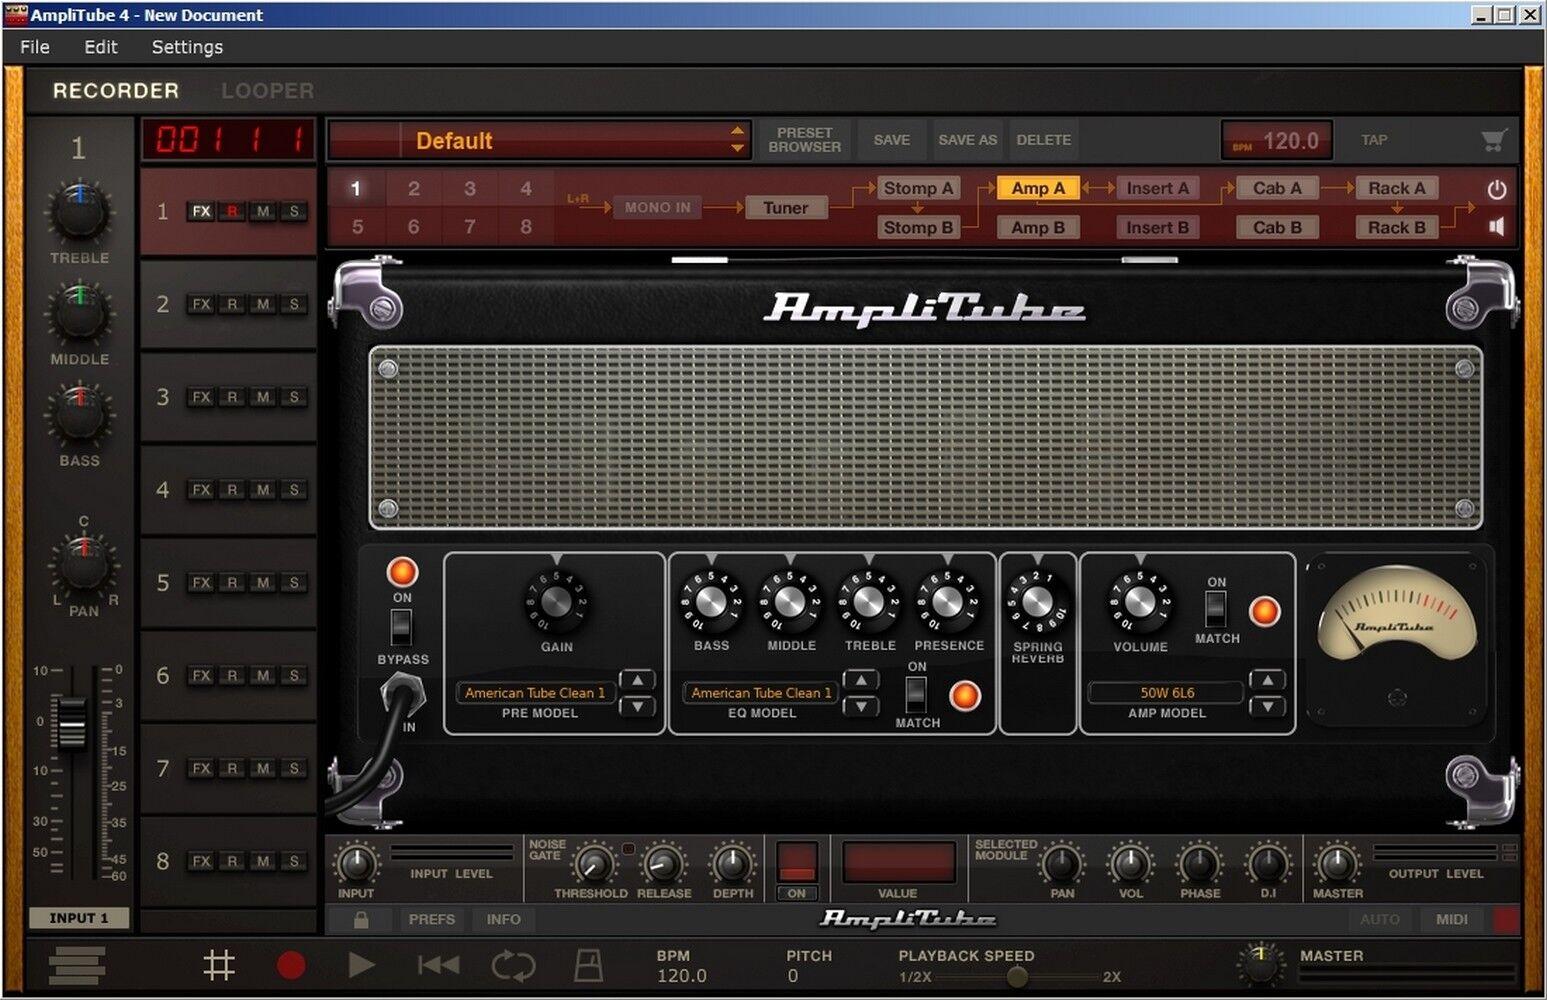 IK Multimedia   Mesa Boogie   Erweiterung f. AmpliTube 4 (Gitarren- Bass-Softw.)